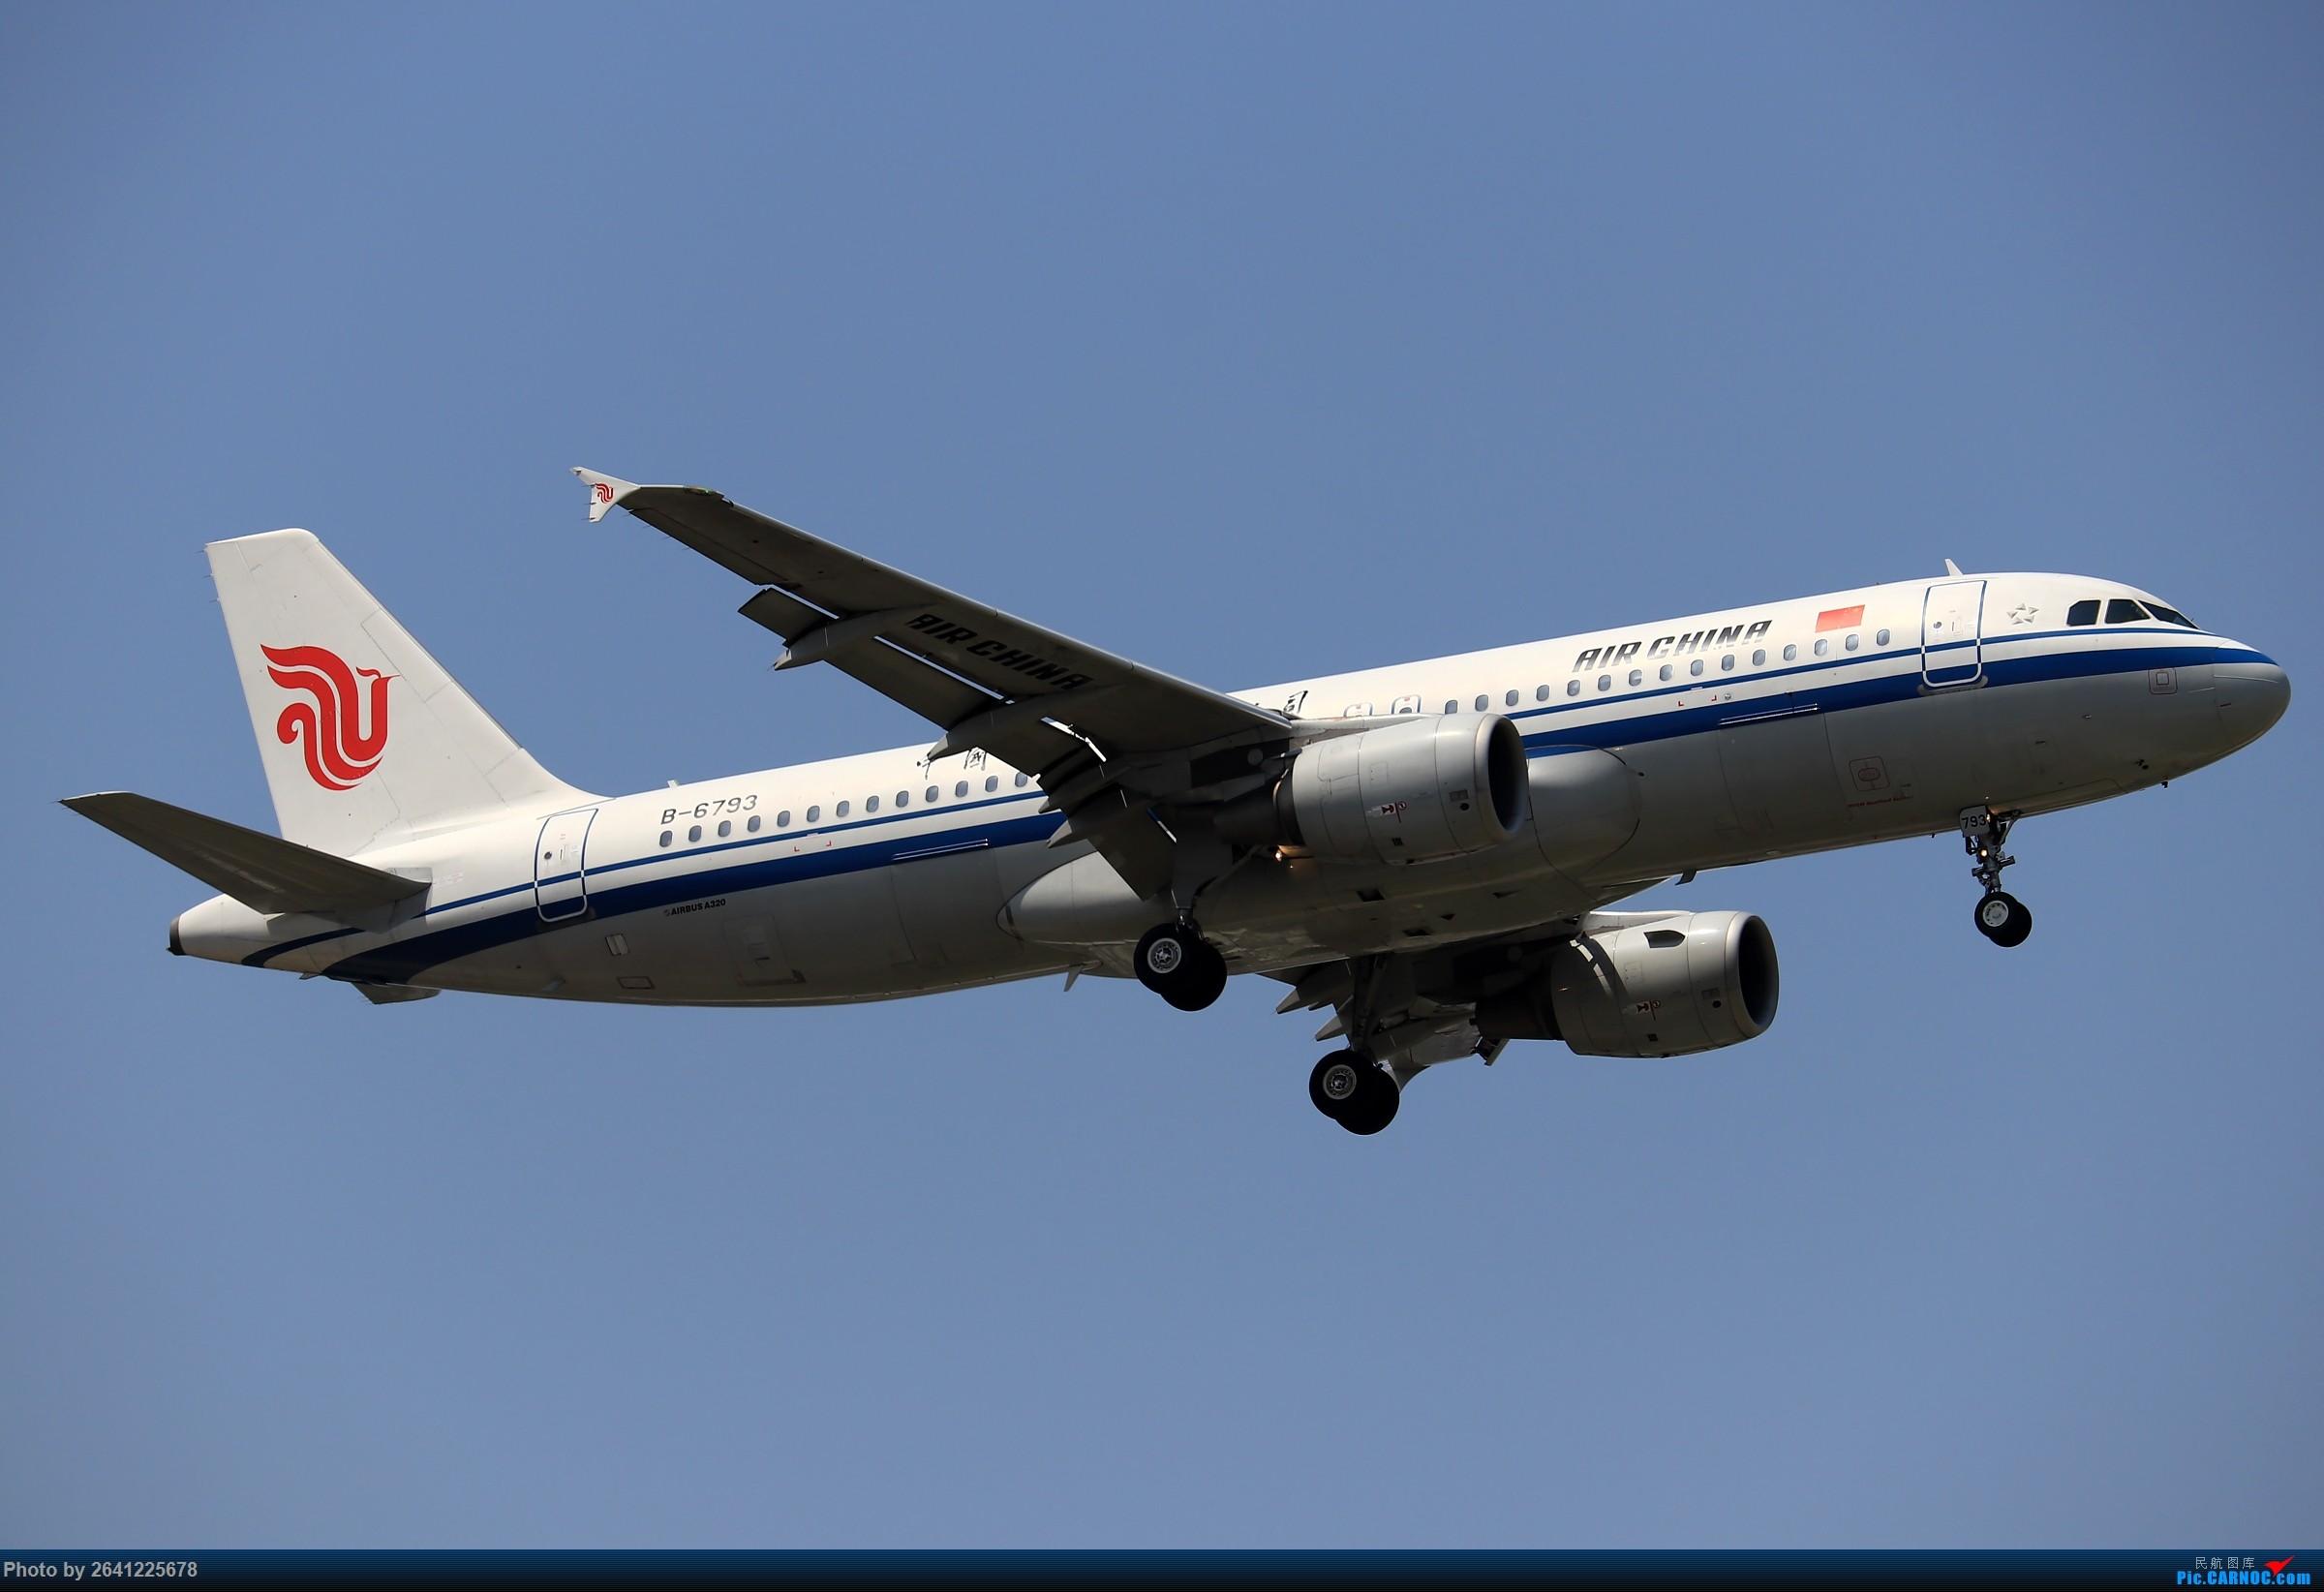 Re:[原创]【TAMRON 156 G2+77D 持续更新中】*****试新机+新镜*****(烂天+地热+渣技术,望大佬多多包涵) AIRBUS A320-200 B-6793 中国北京首都国际机场